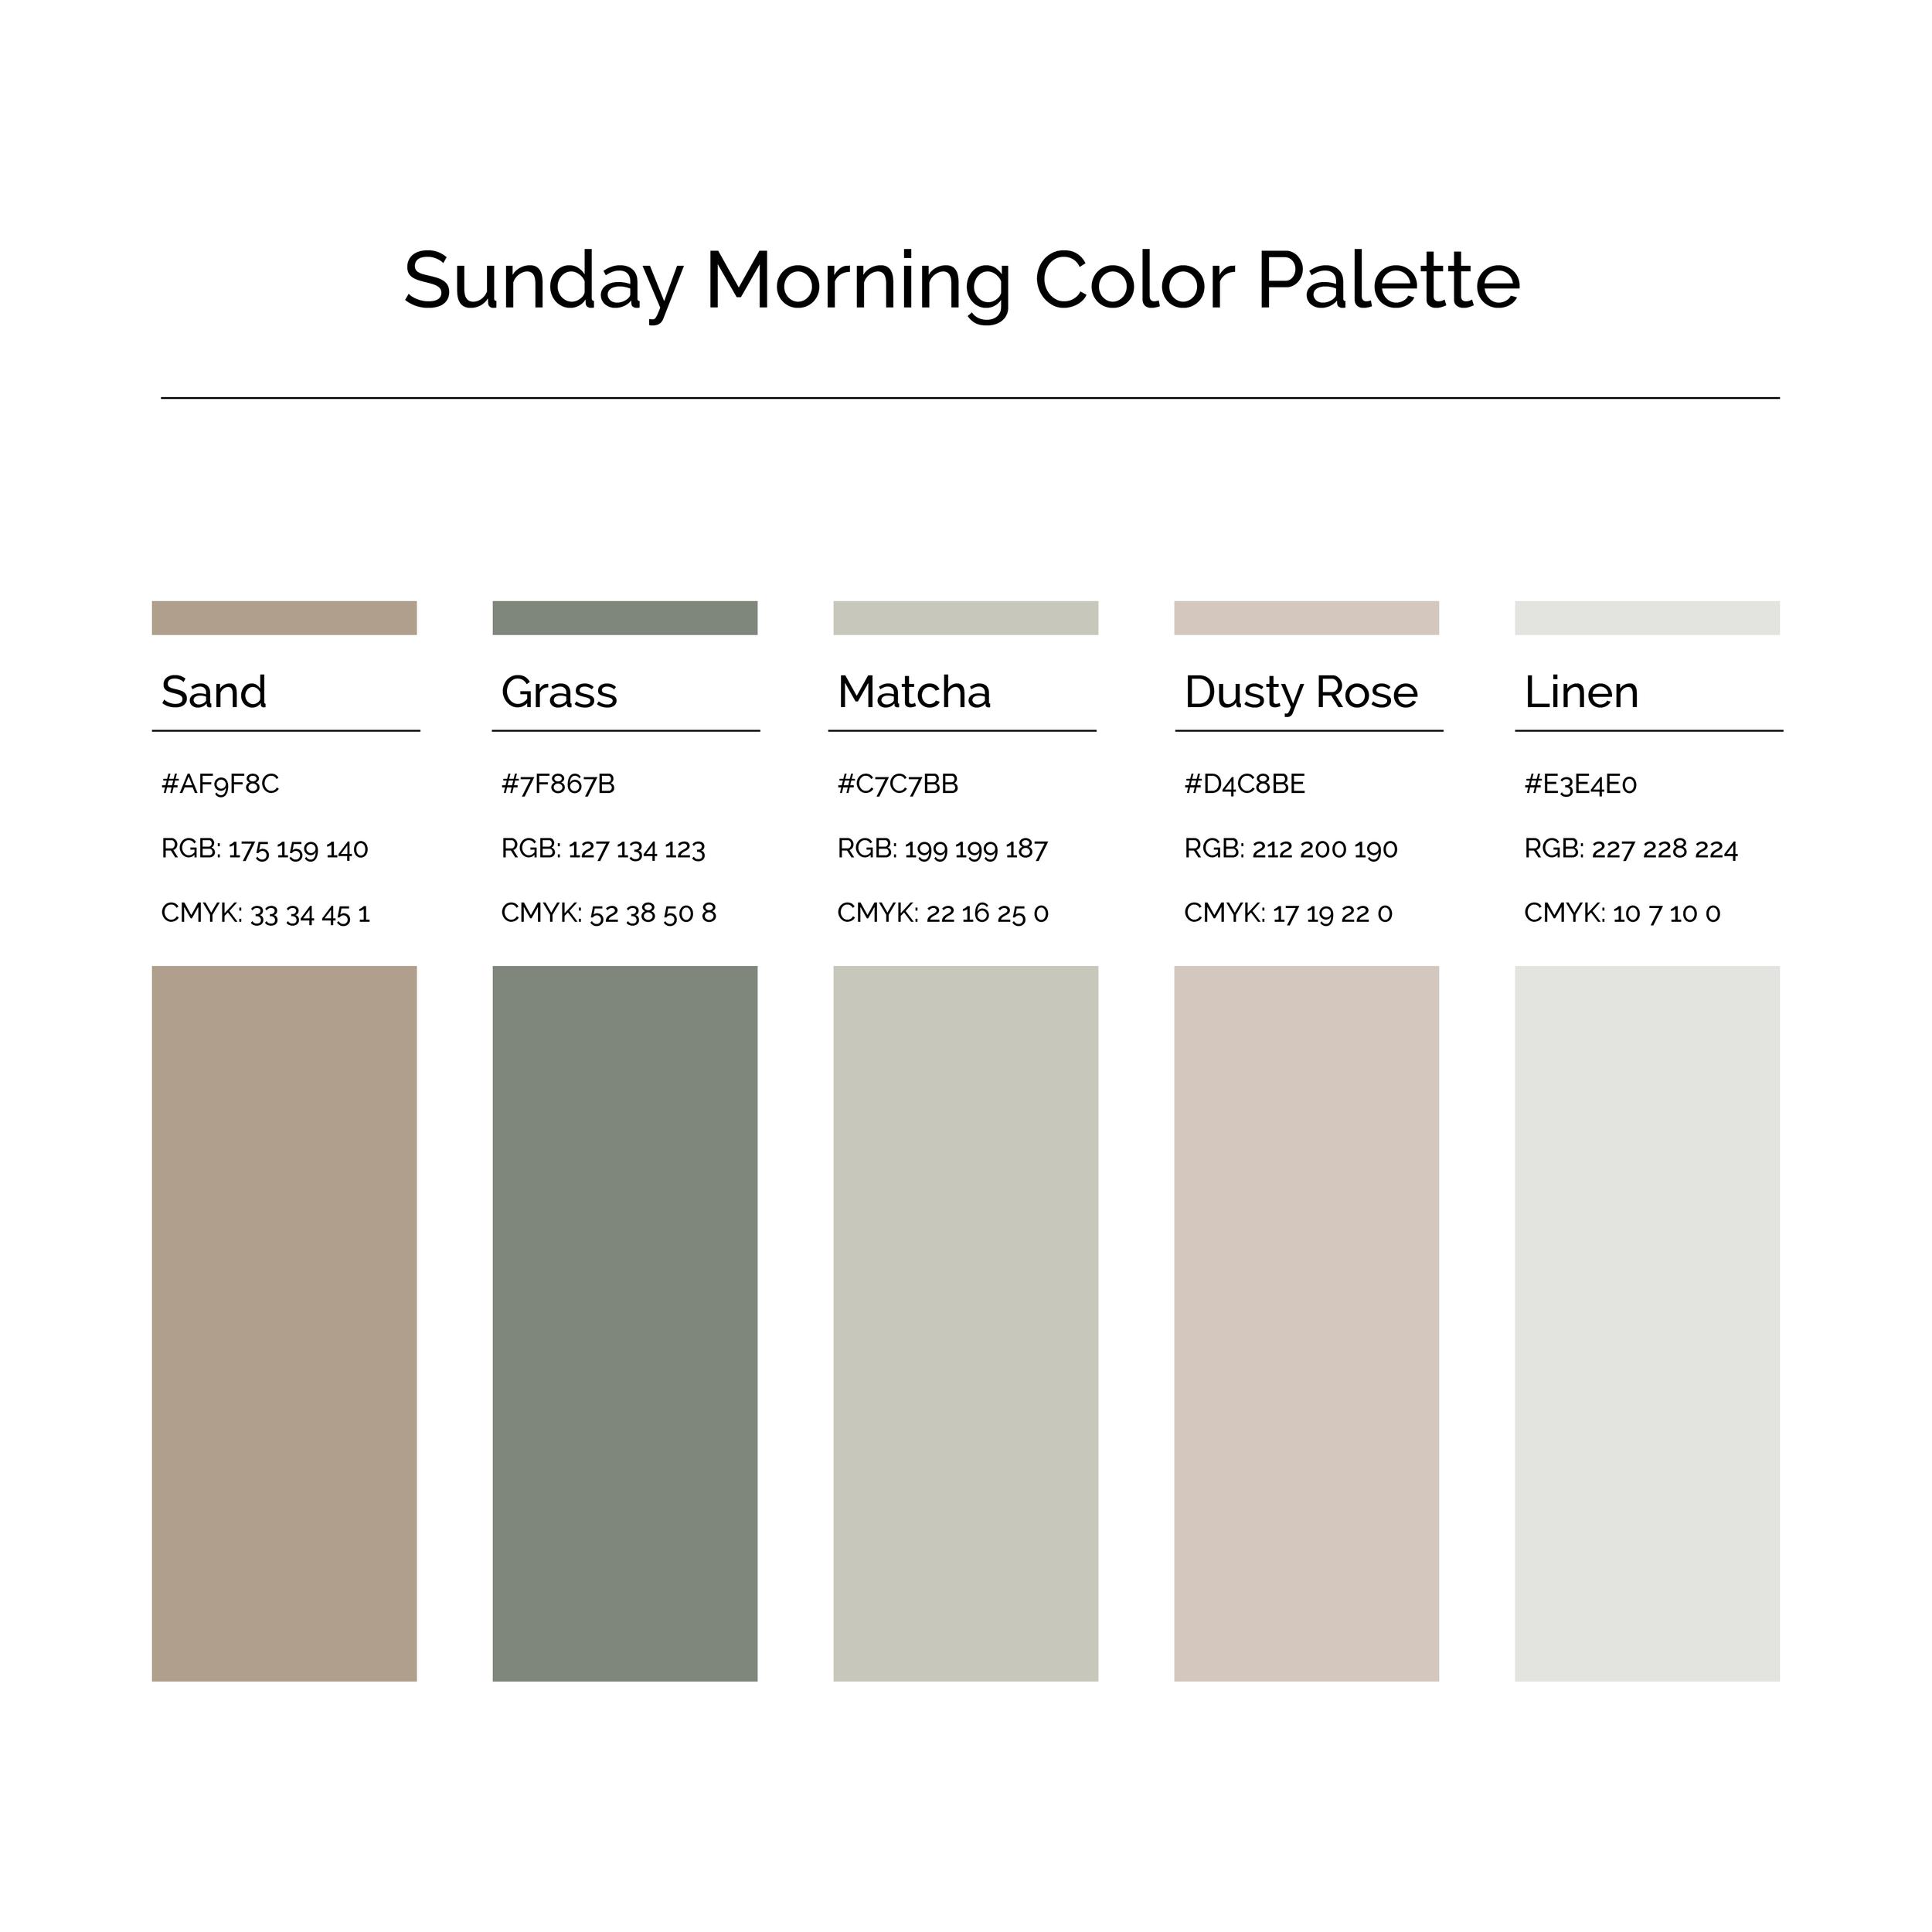 15 More Color Palettes | Sunday Morning Color Palette